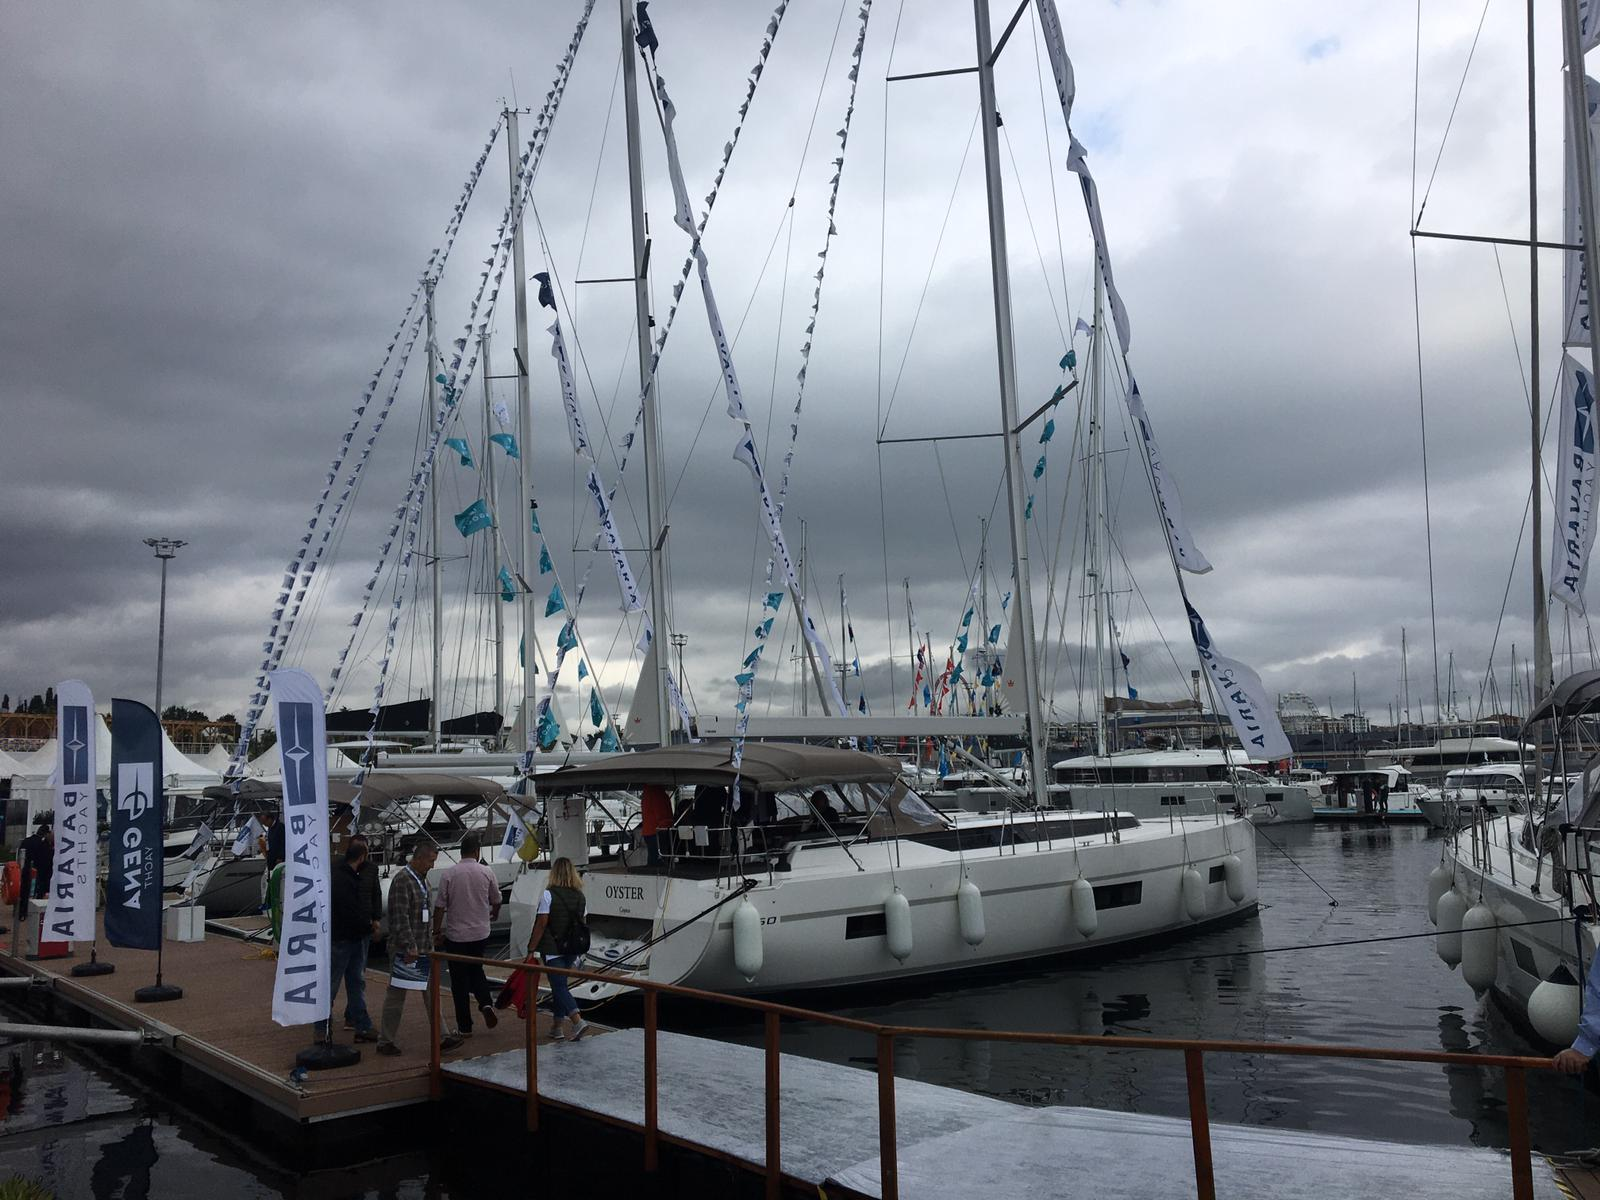 boat-show1.jpg